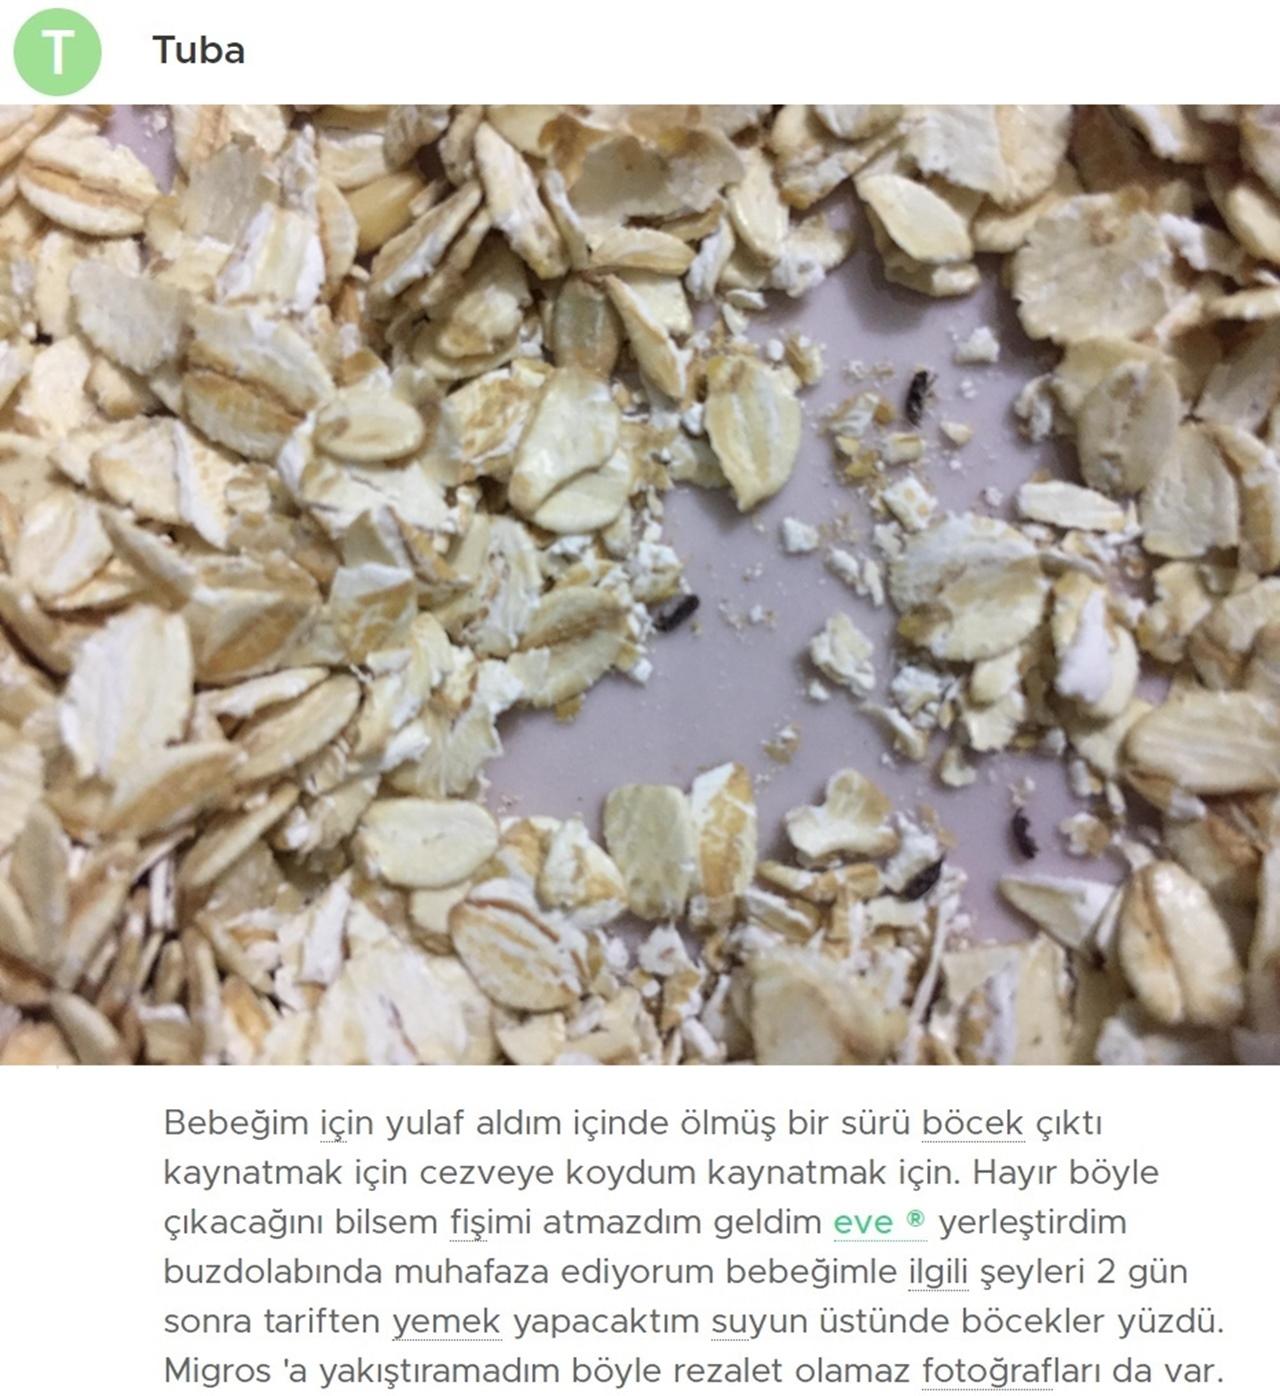 migros böcek yulaflar